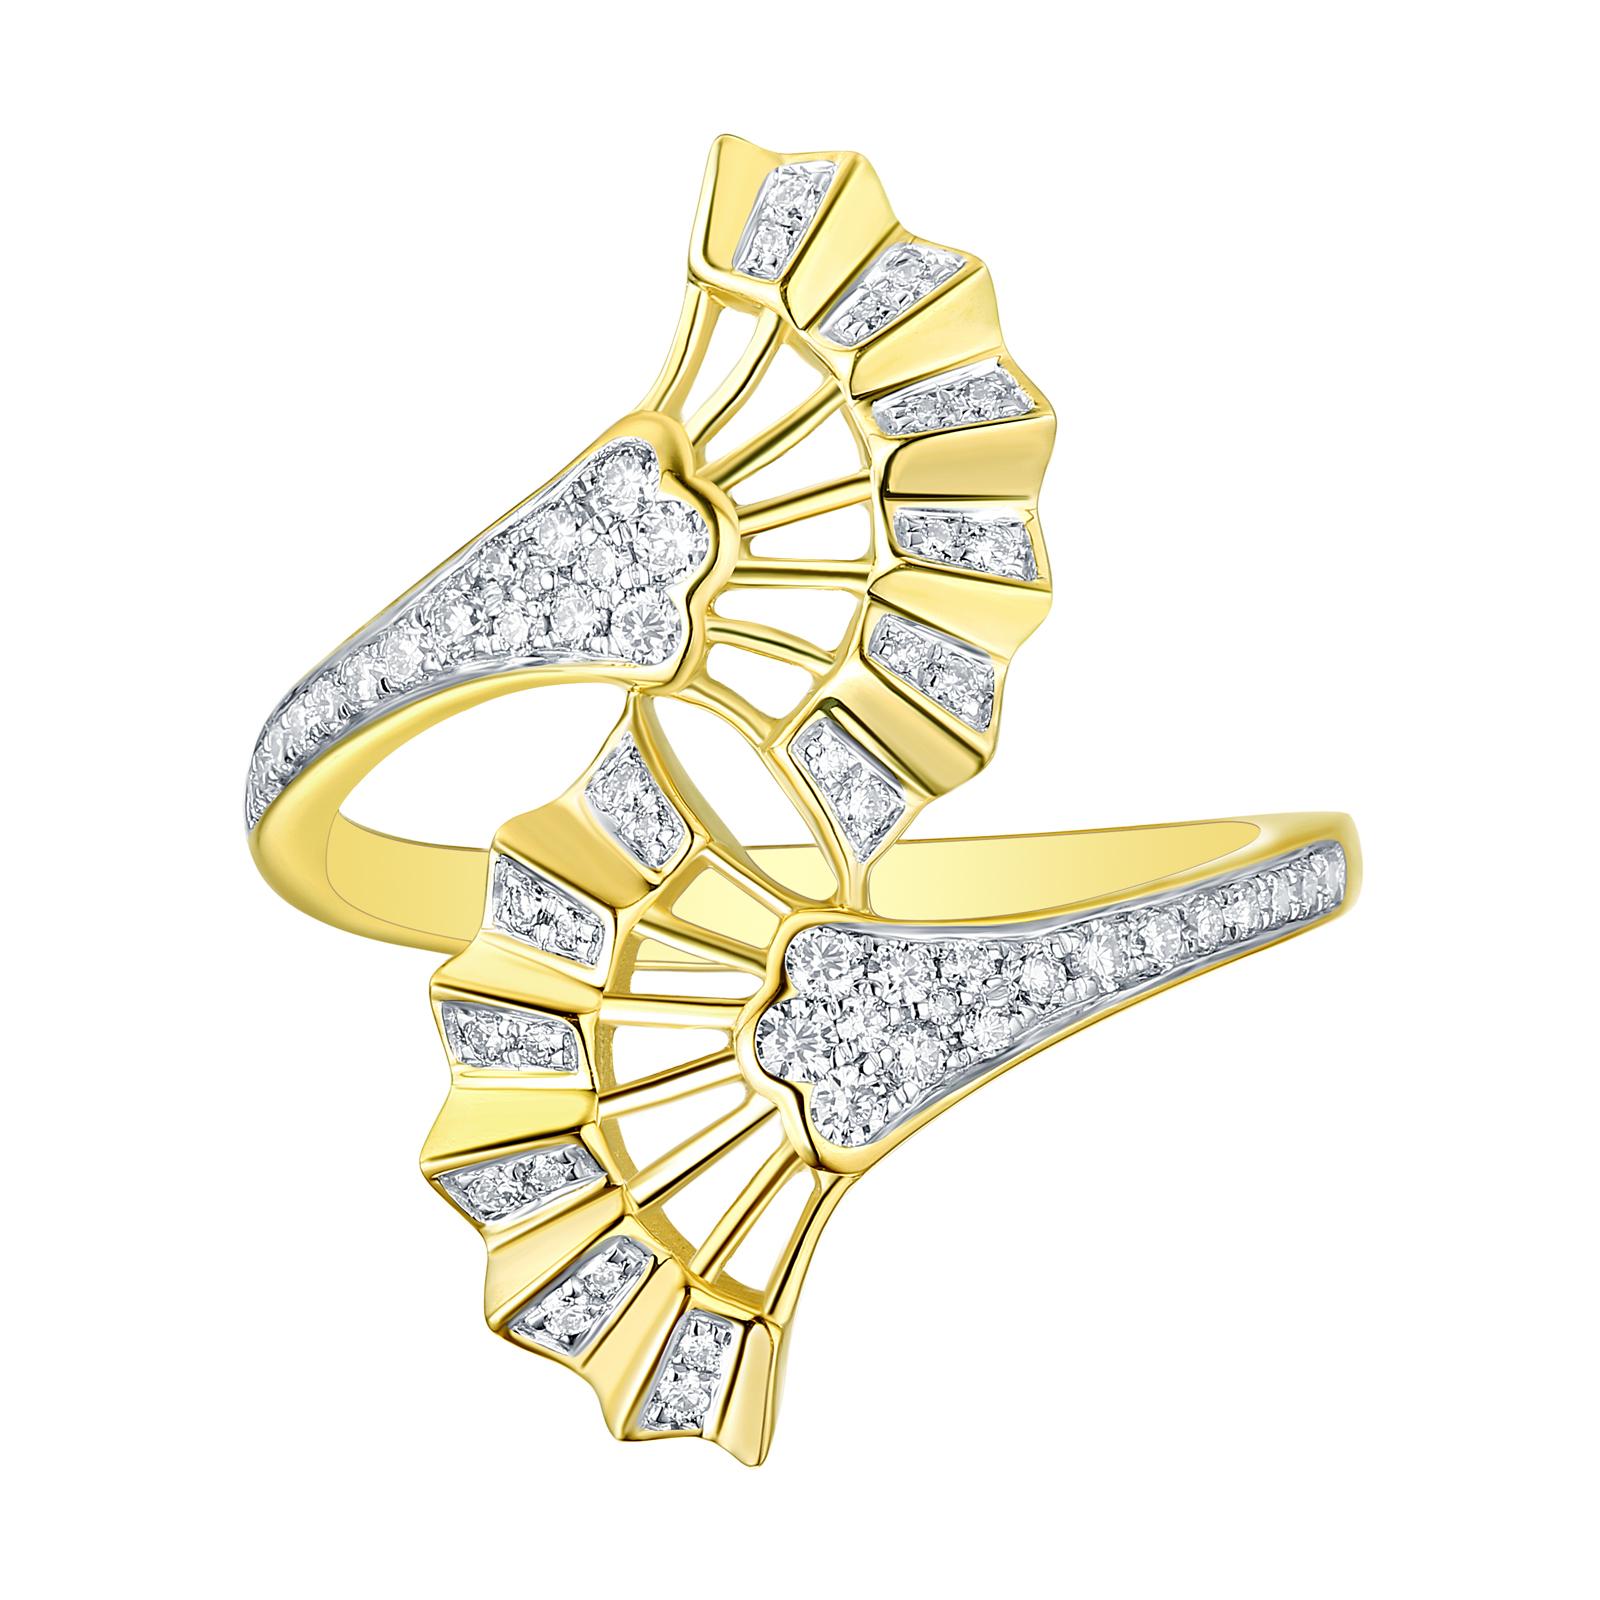 R29925WHT- 14K Yellow Gold Diamond Ring, 3.81 TCW